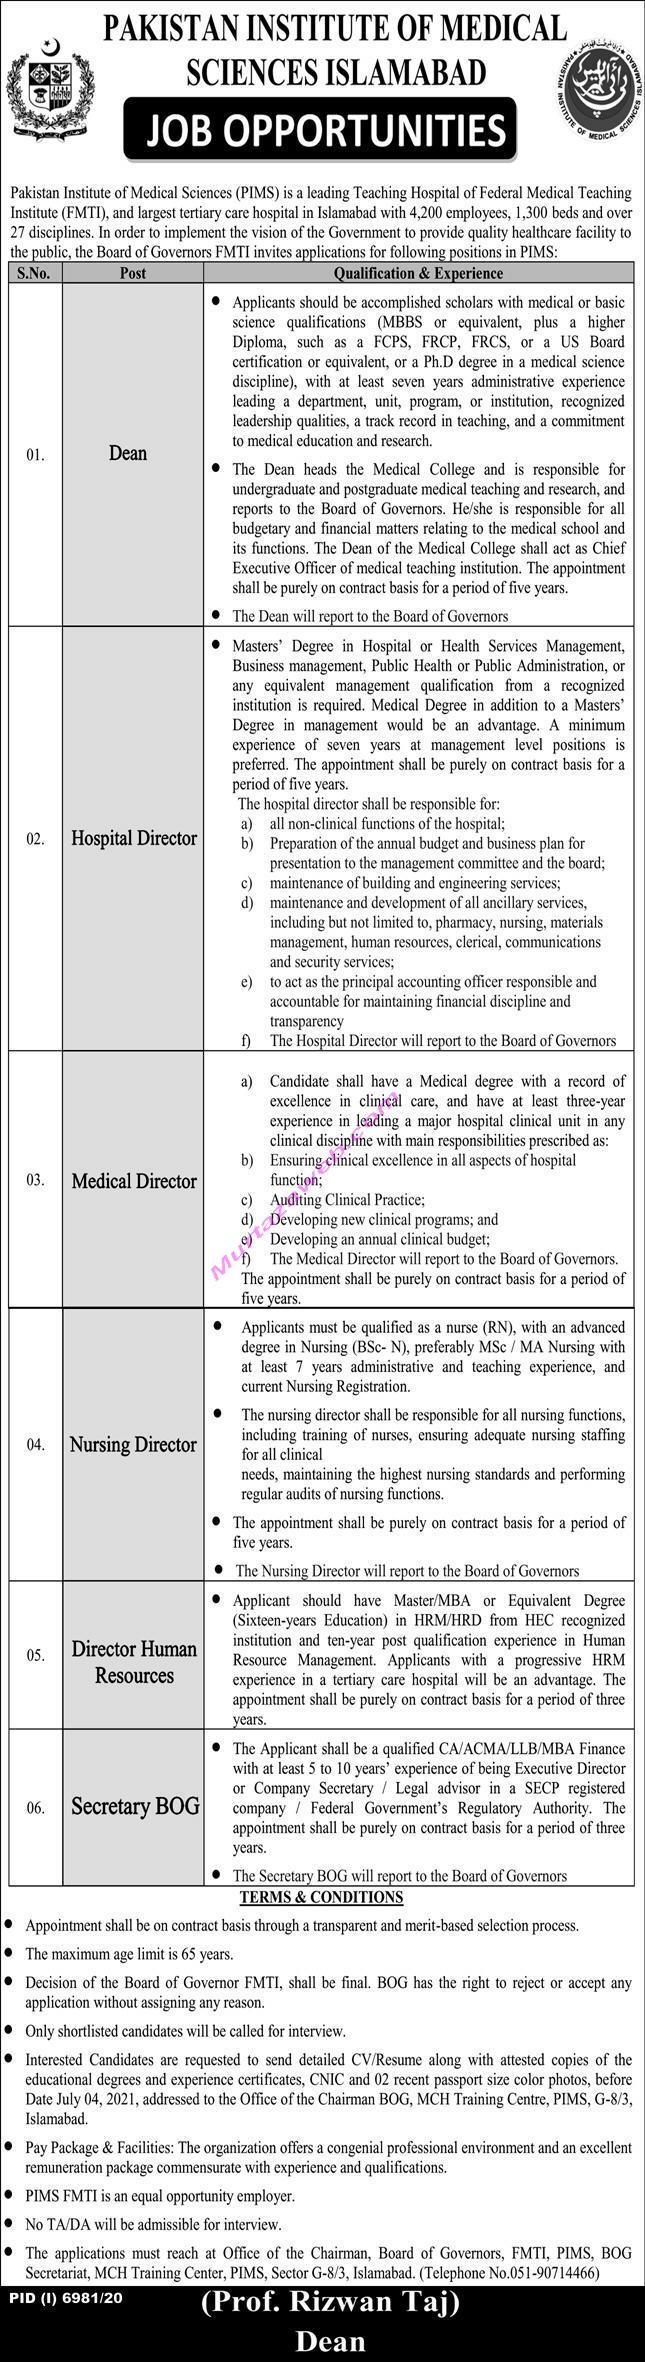 Pakistan Institute of Medical Sciences Islamabad Jobs 2021